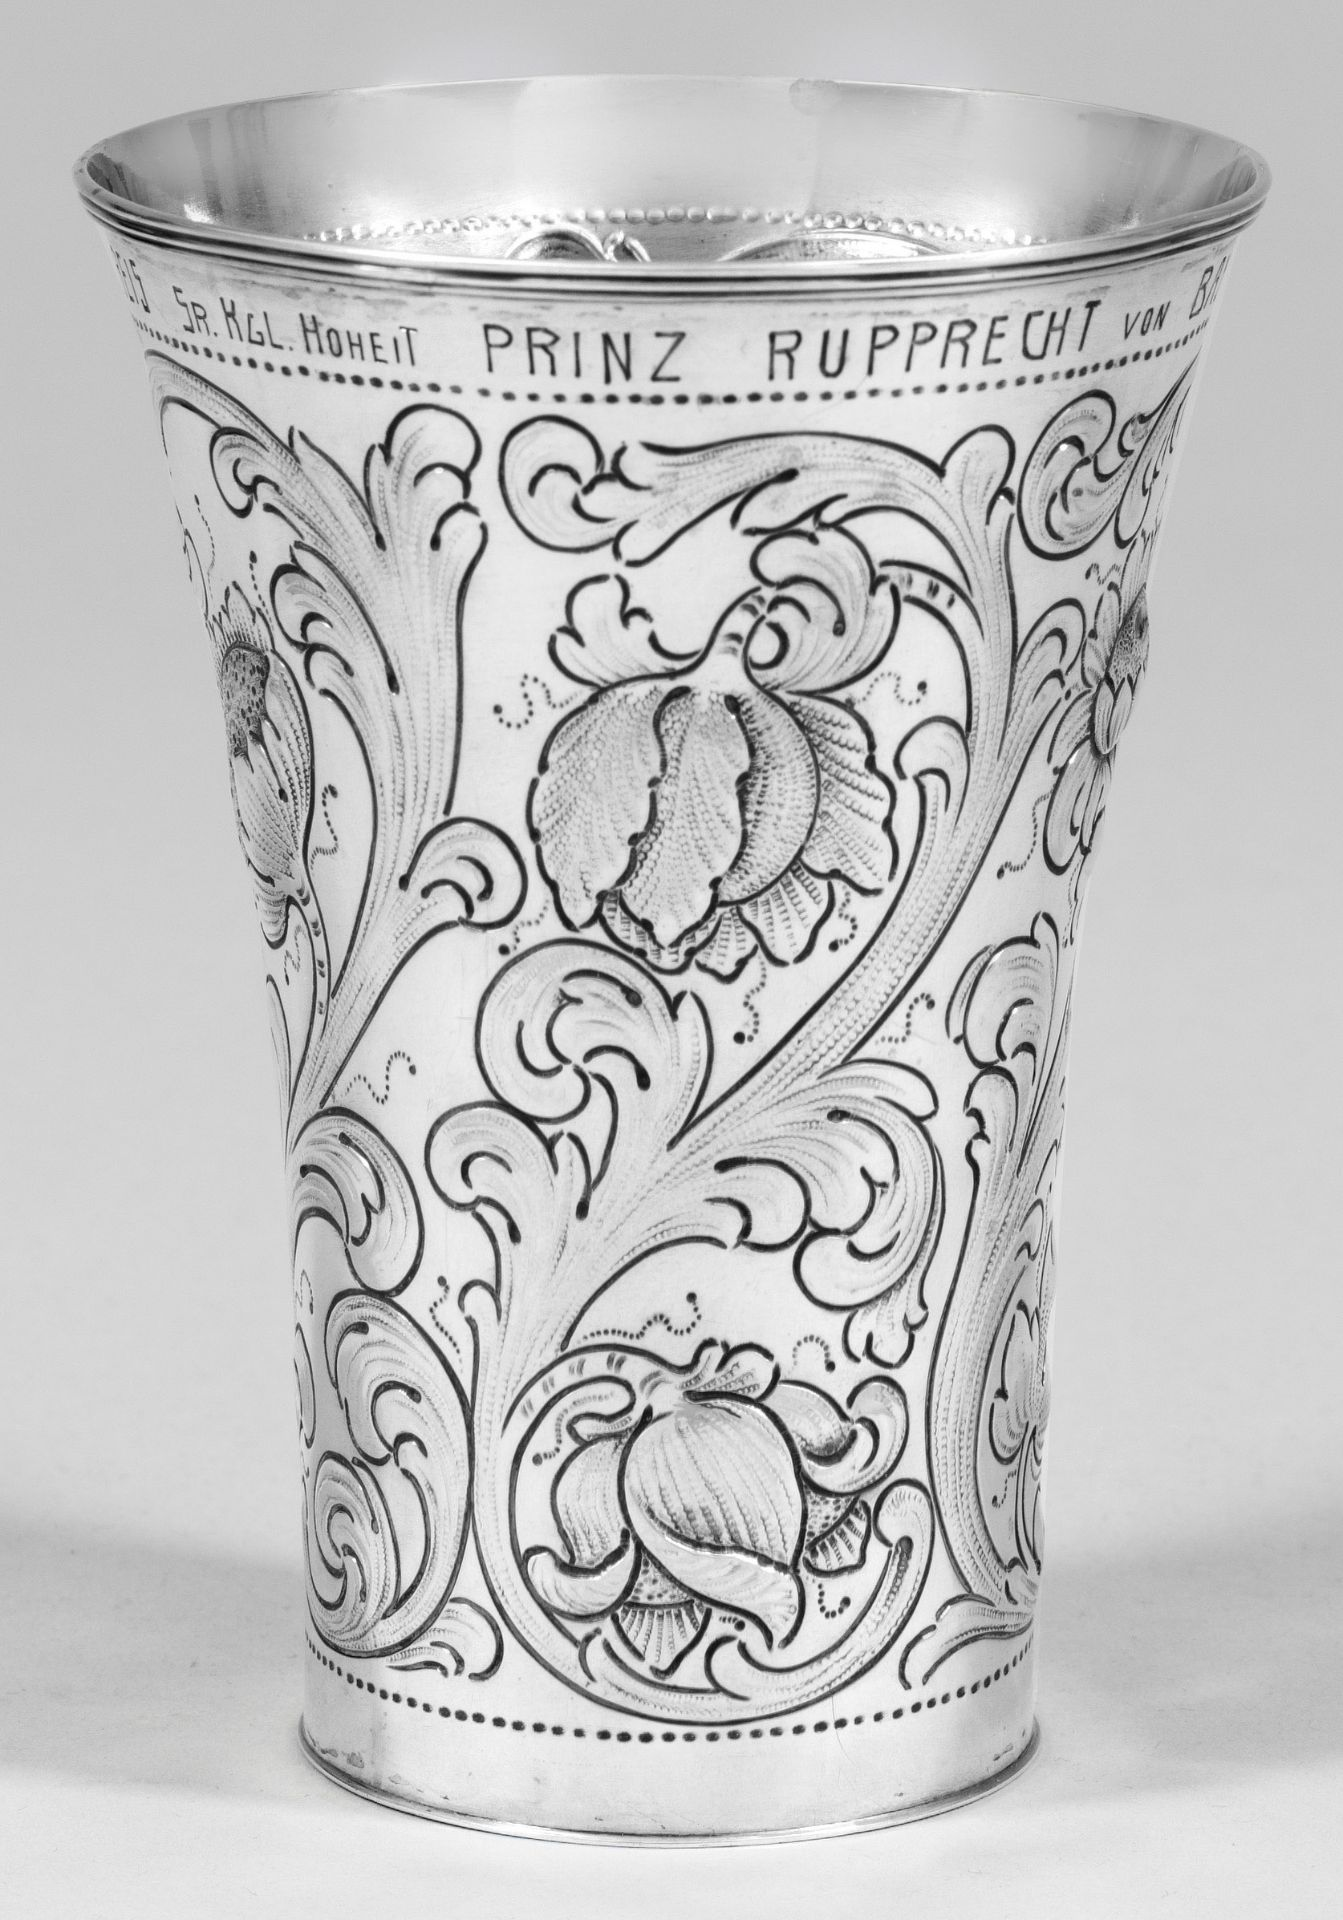 Seltene Bechertrophäe - Image 2 of 3